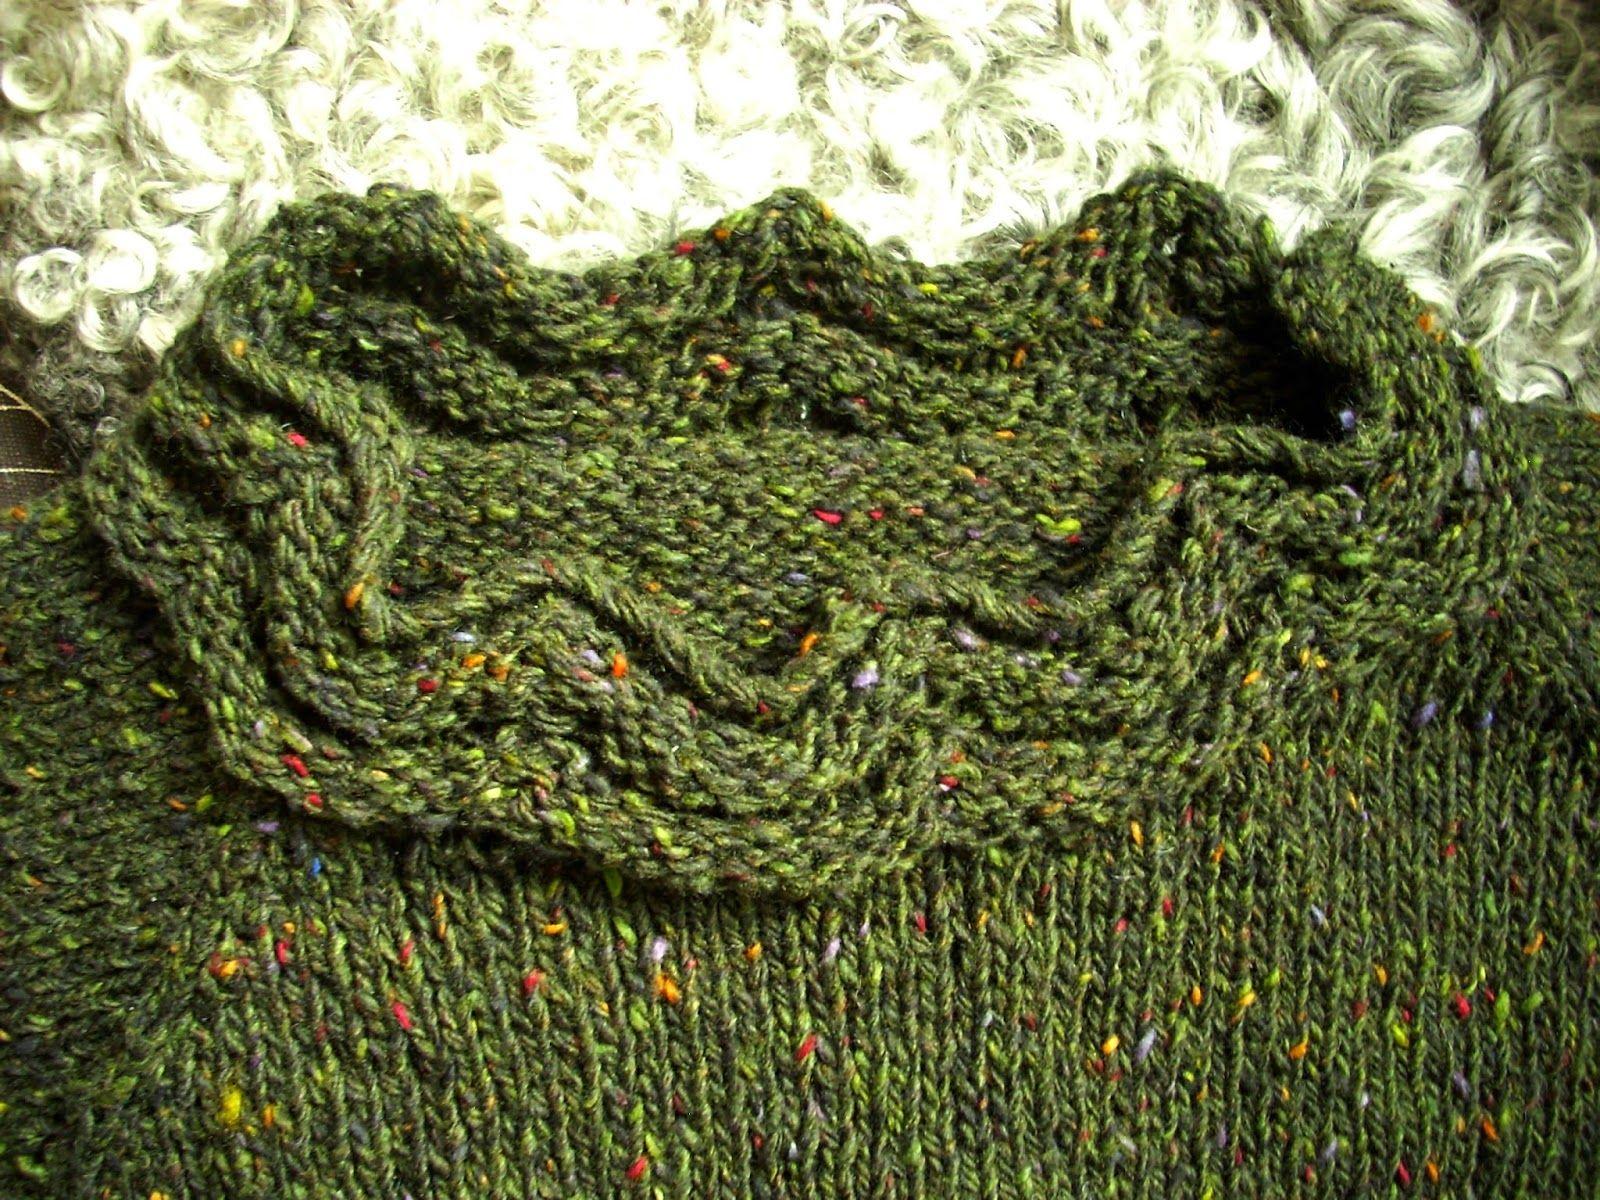 Asplund knits- gorgeous collar and wool - skogens+konung+2.jpg 1,600×1,200 pixels